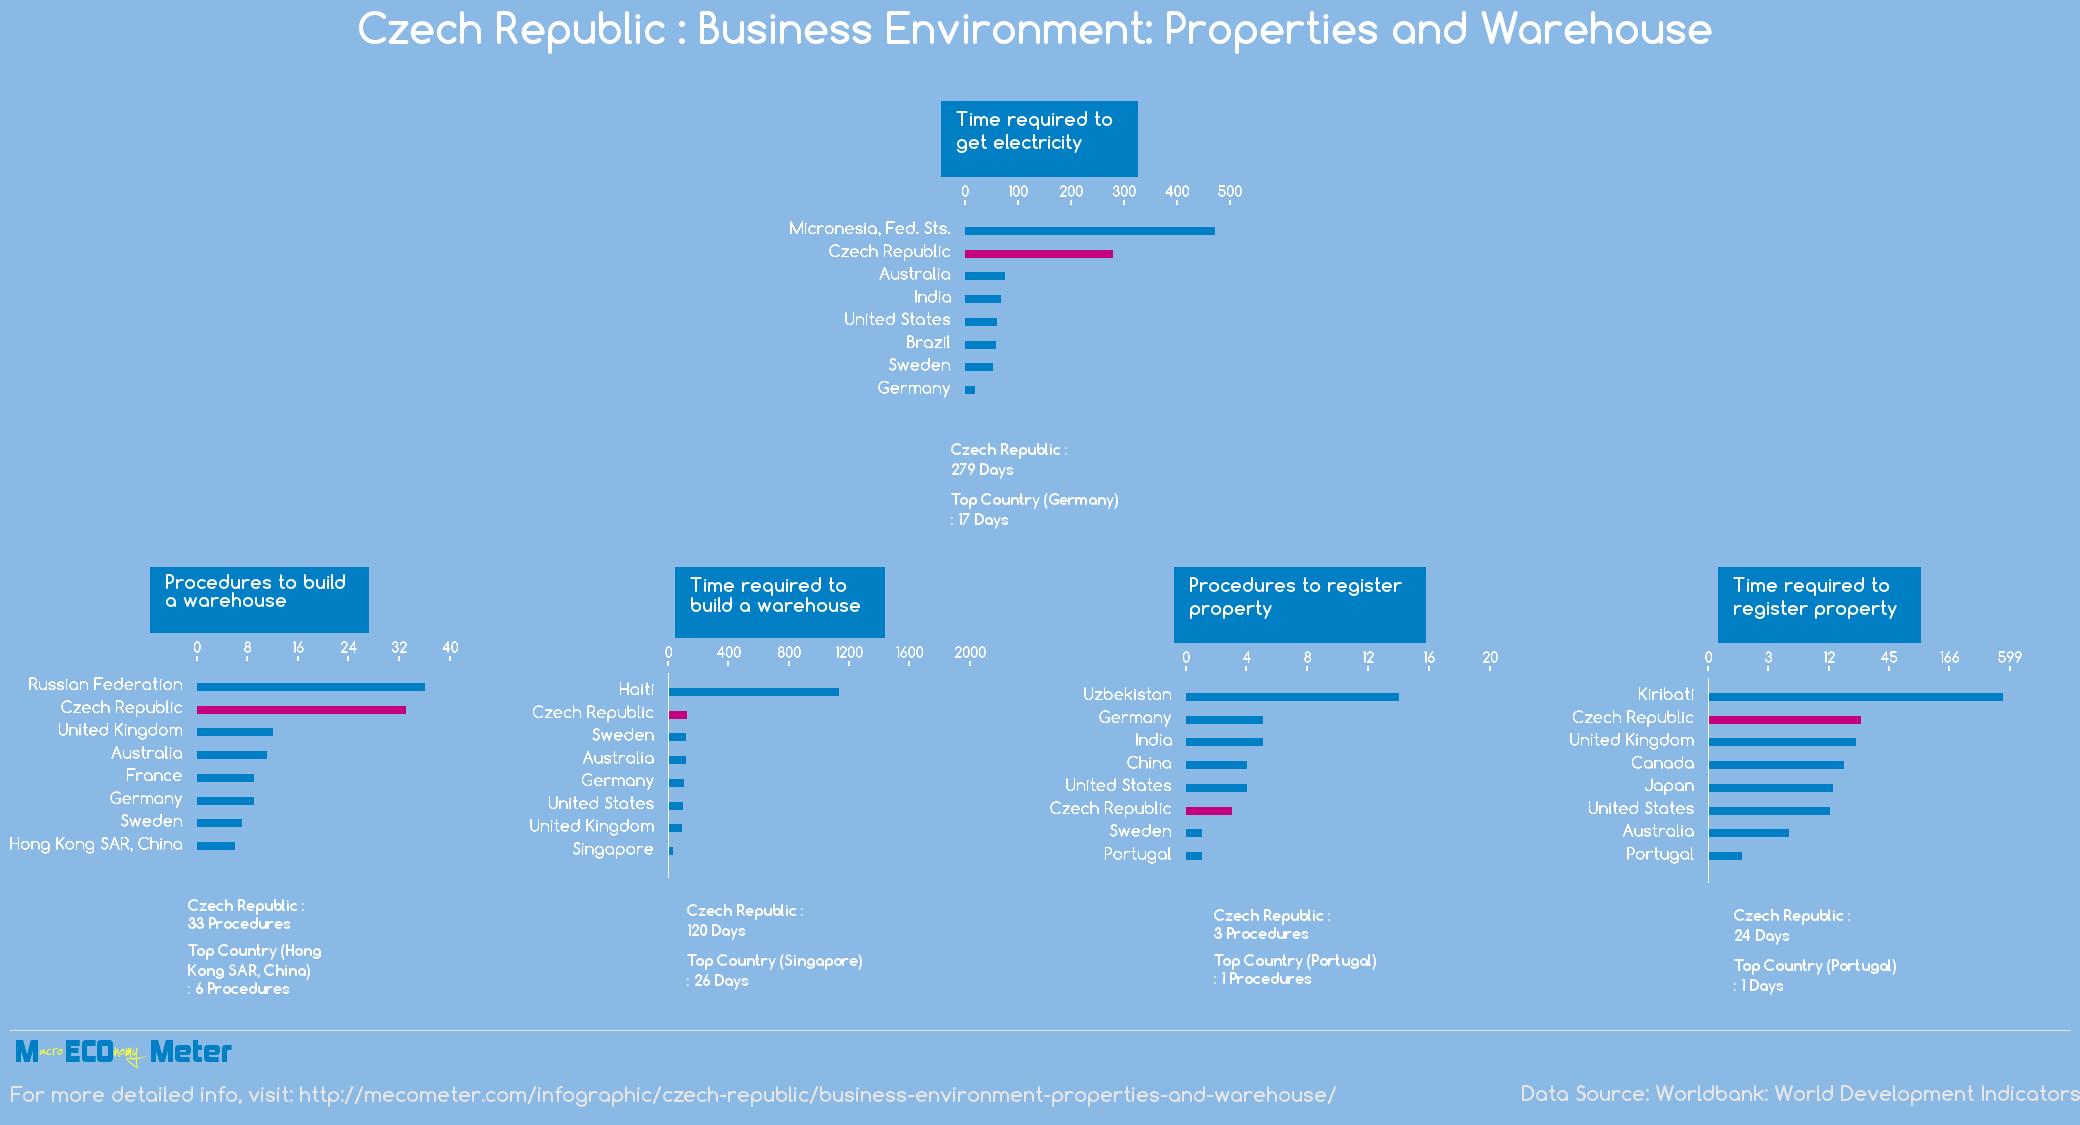 Czech Republic : Business Environment: Properties and Warehouse